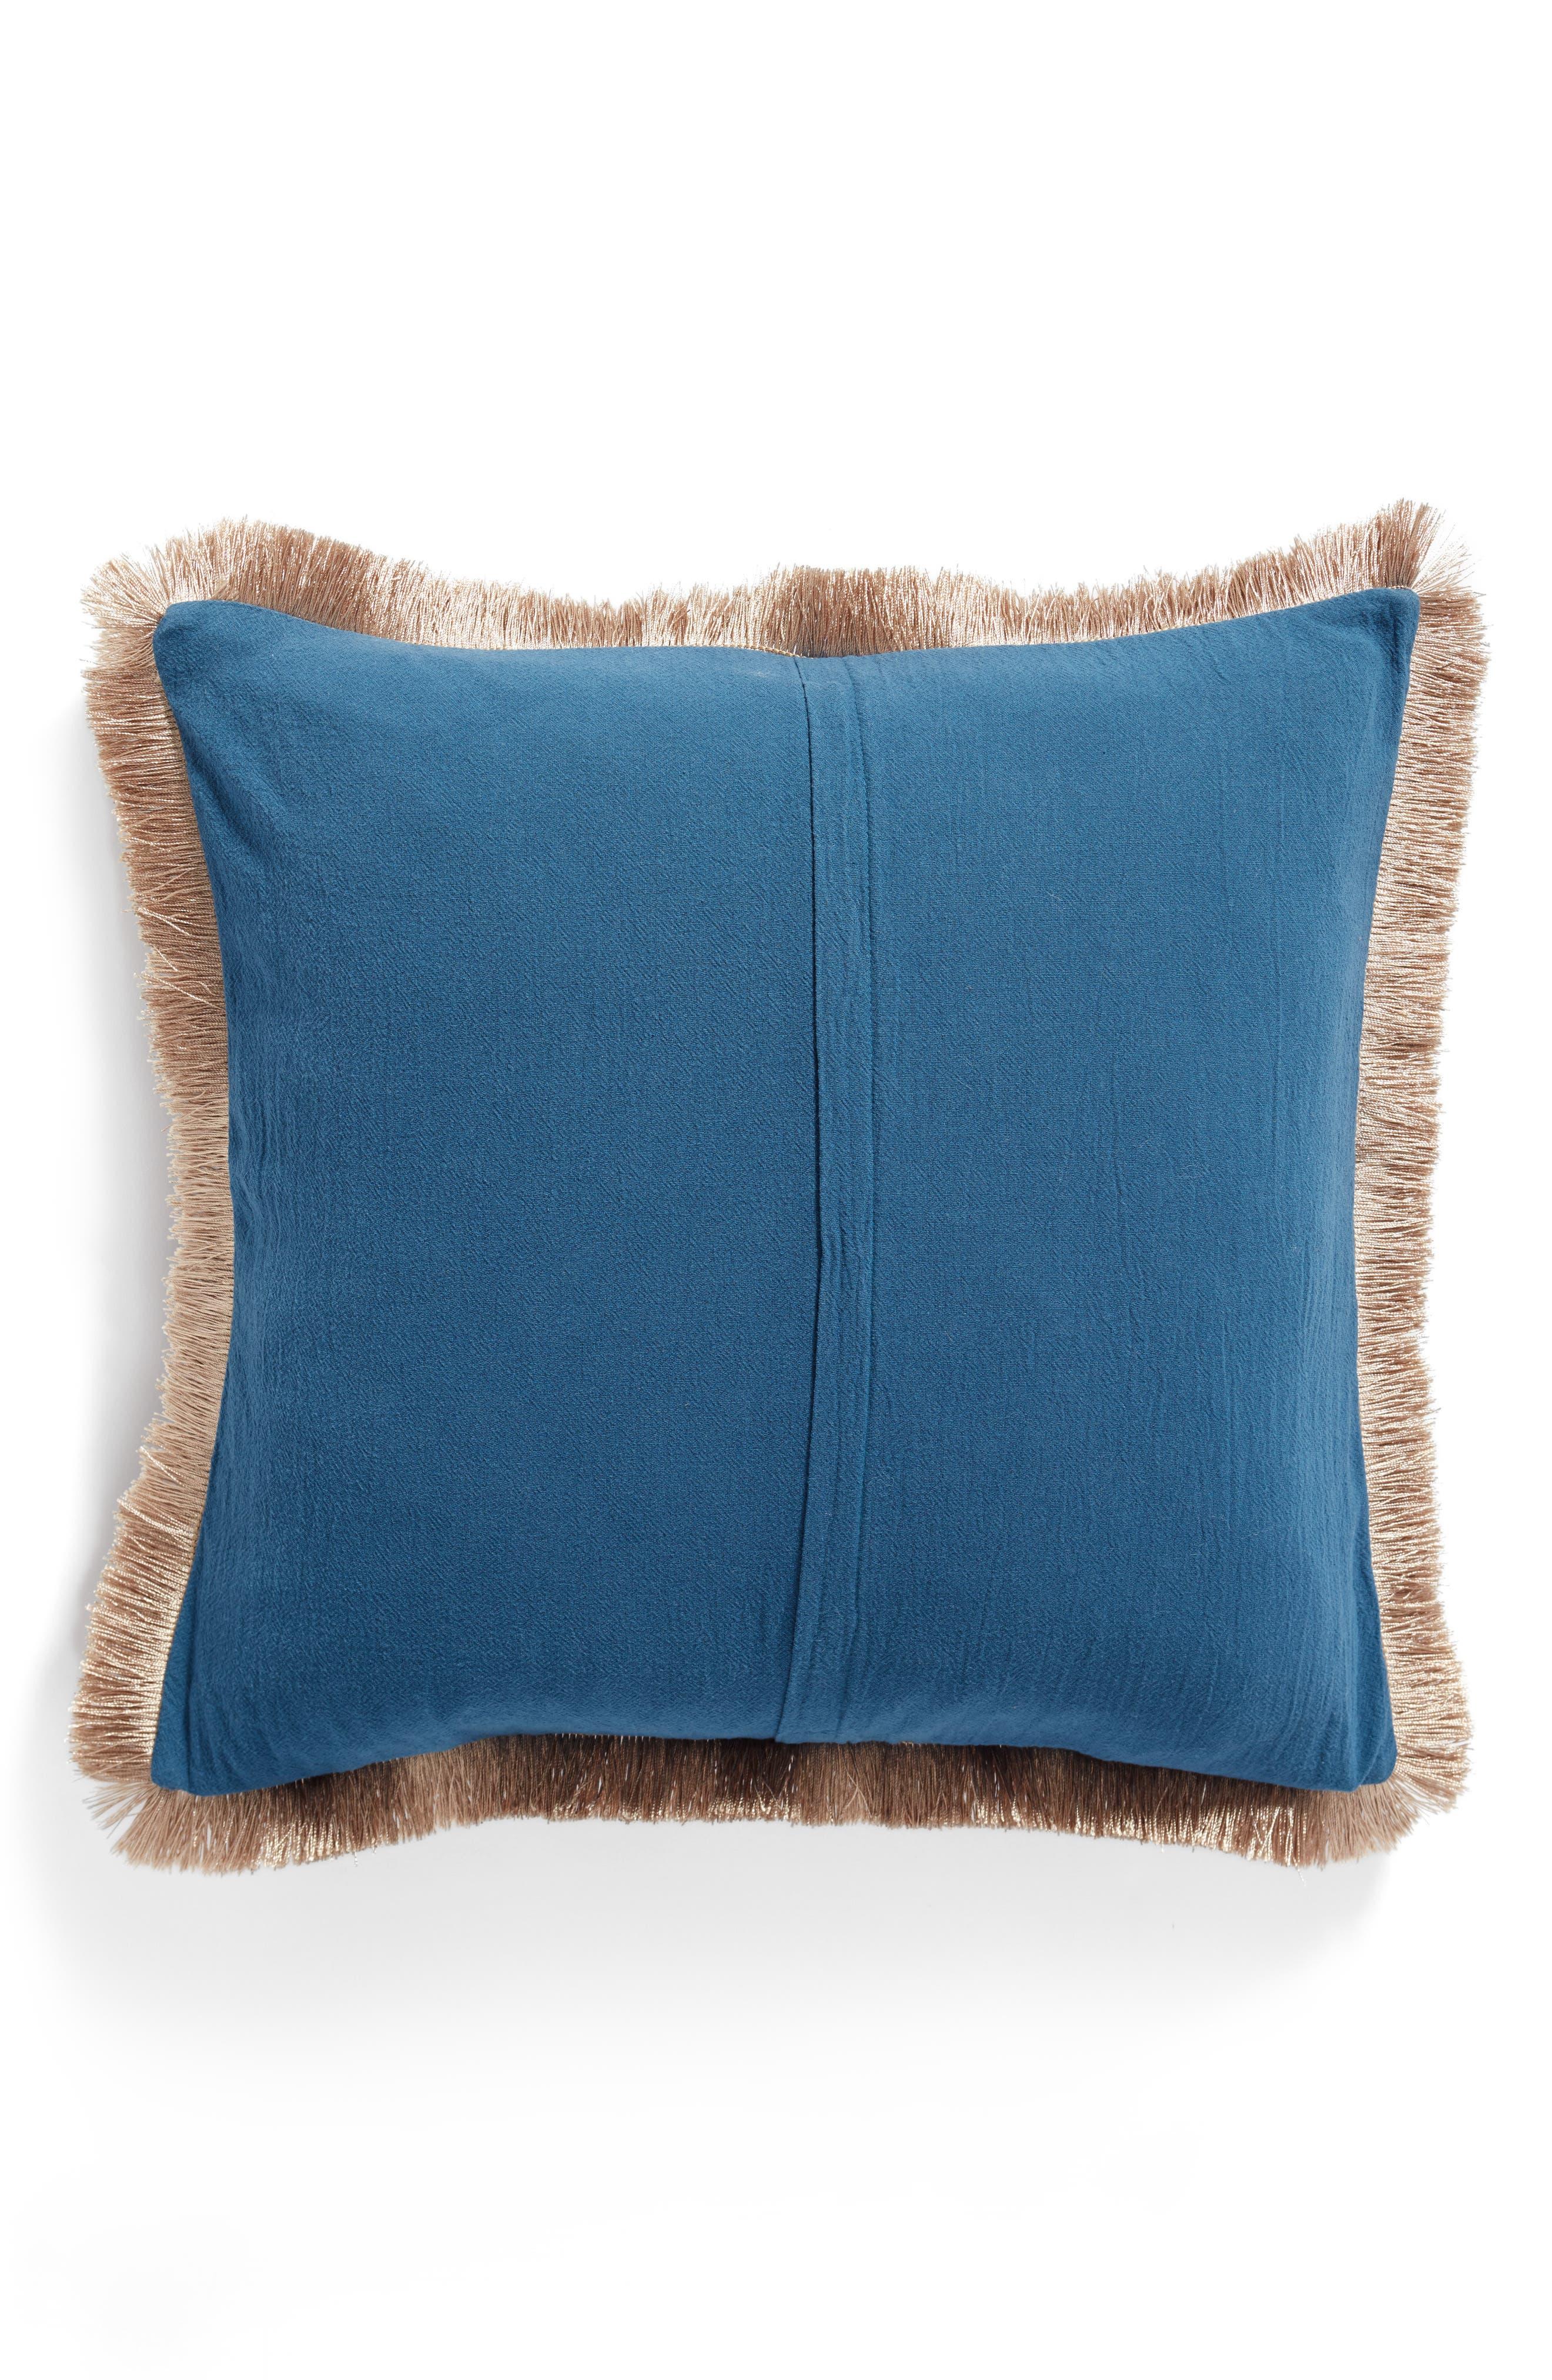 Beckett Wild & Free Pillow,                             Alternate thumbnail 2, color,                             400